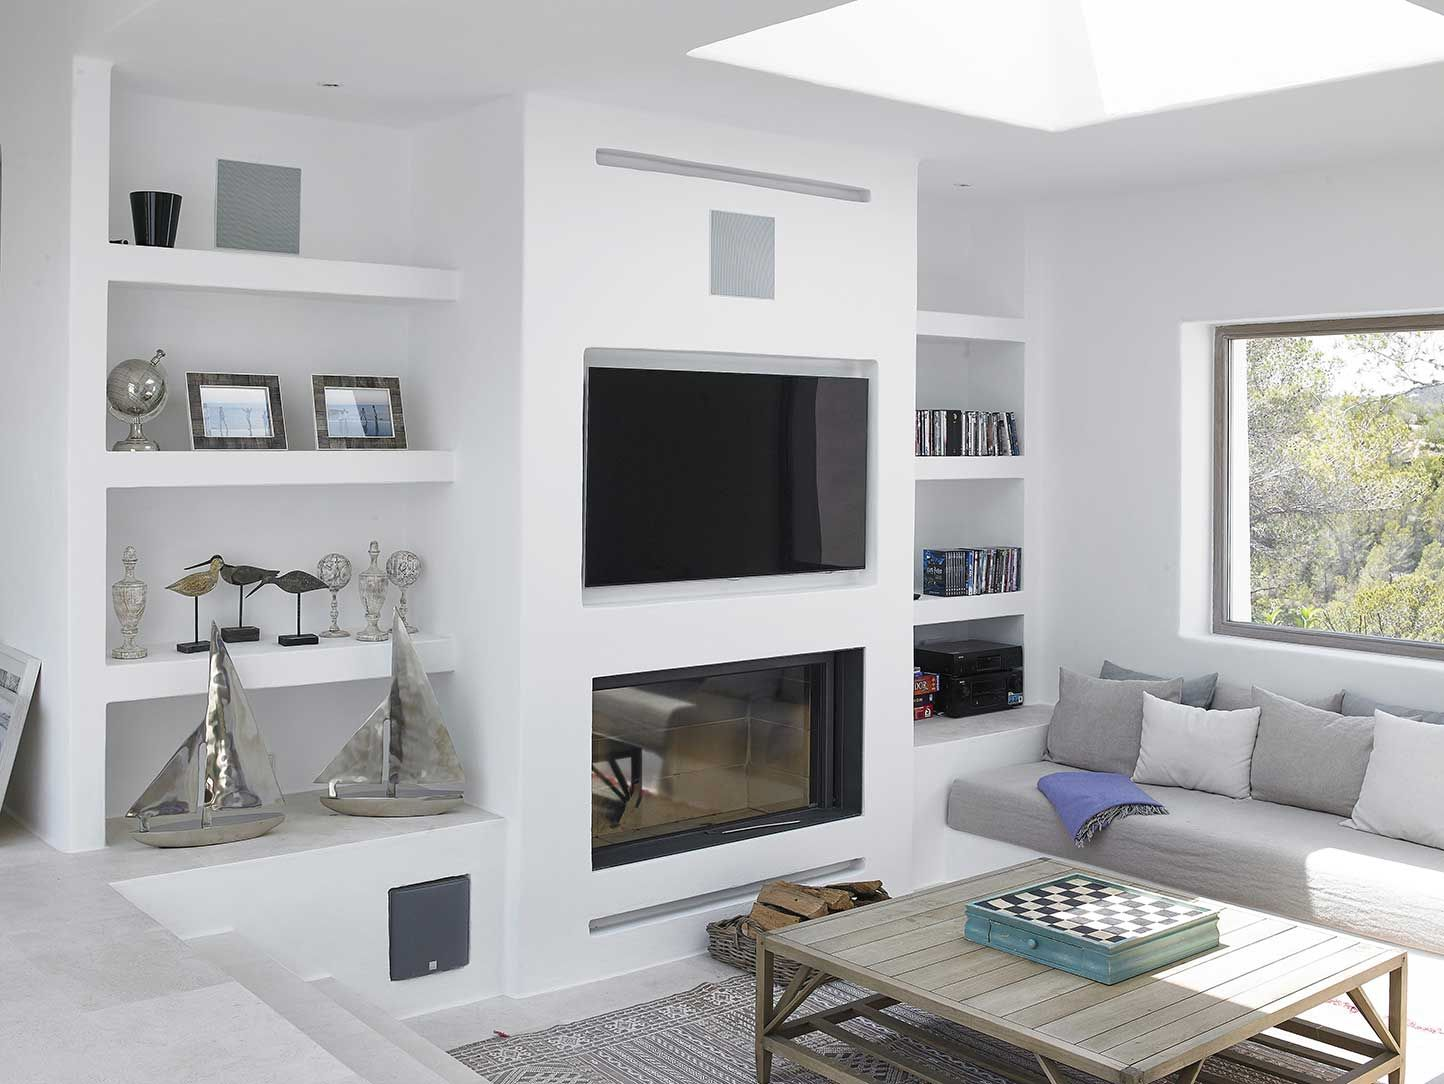 Blakstad design consultants proyectos decoracion for Estufa hogar moderna